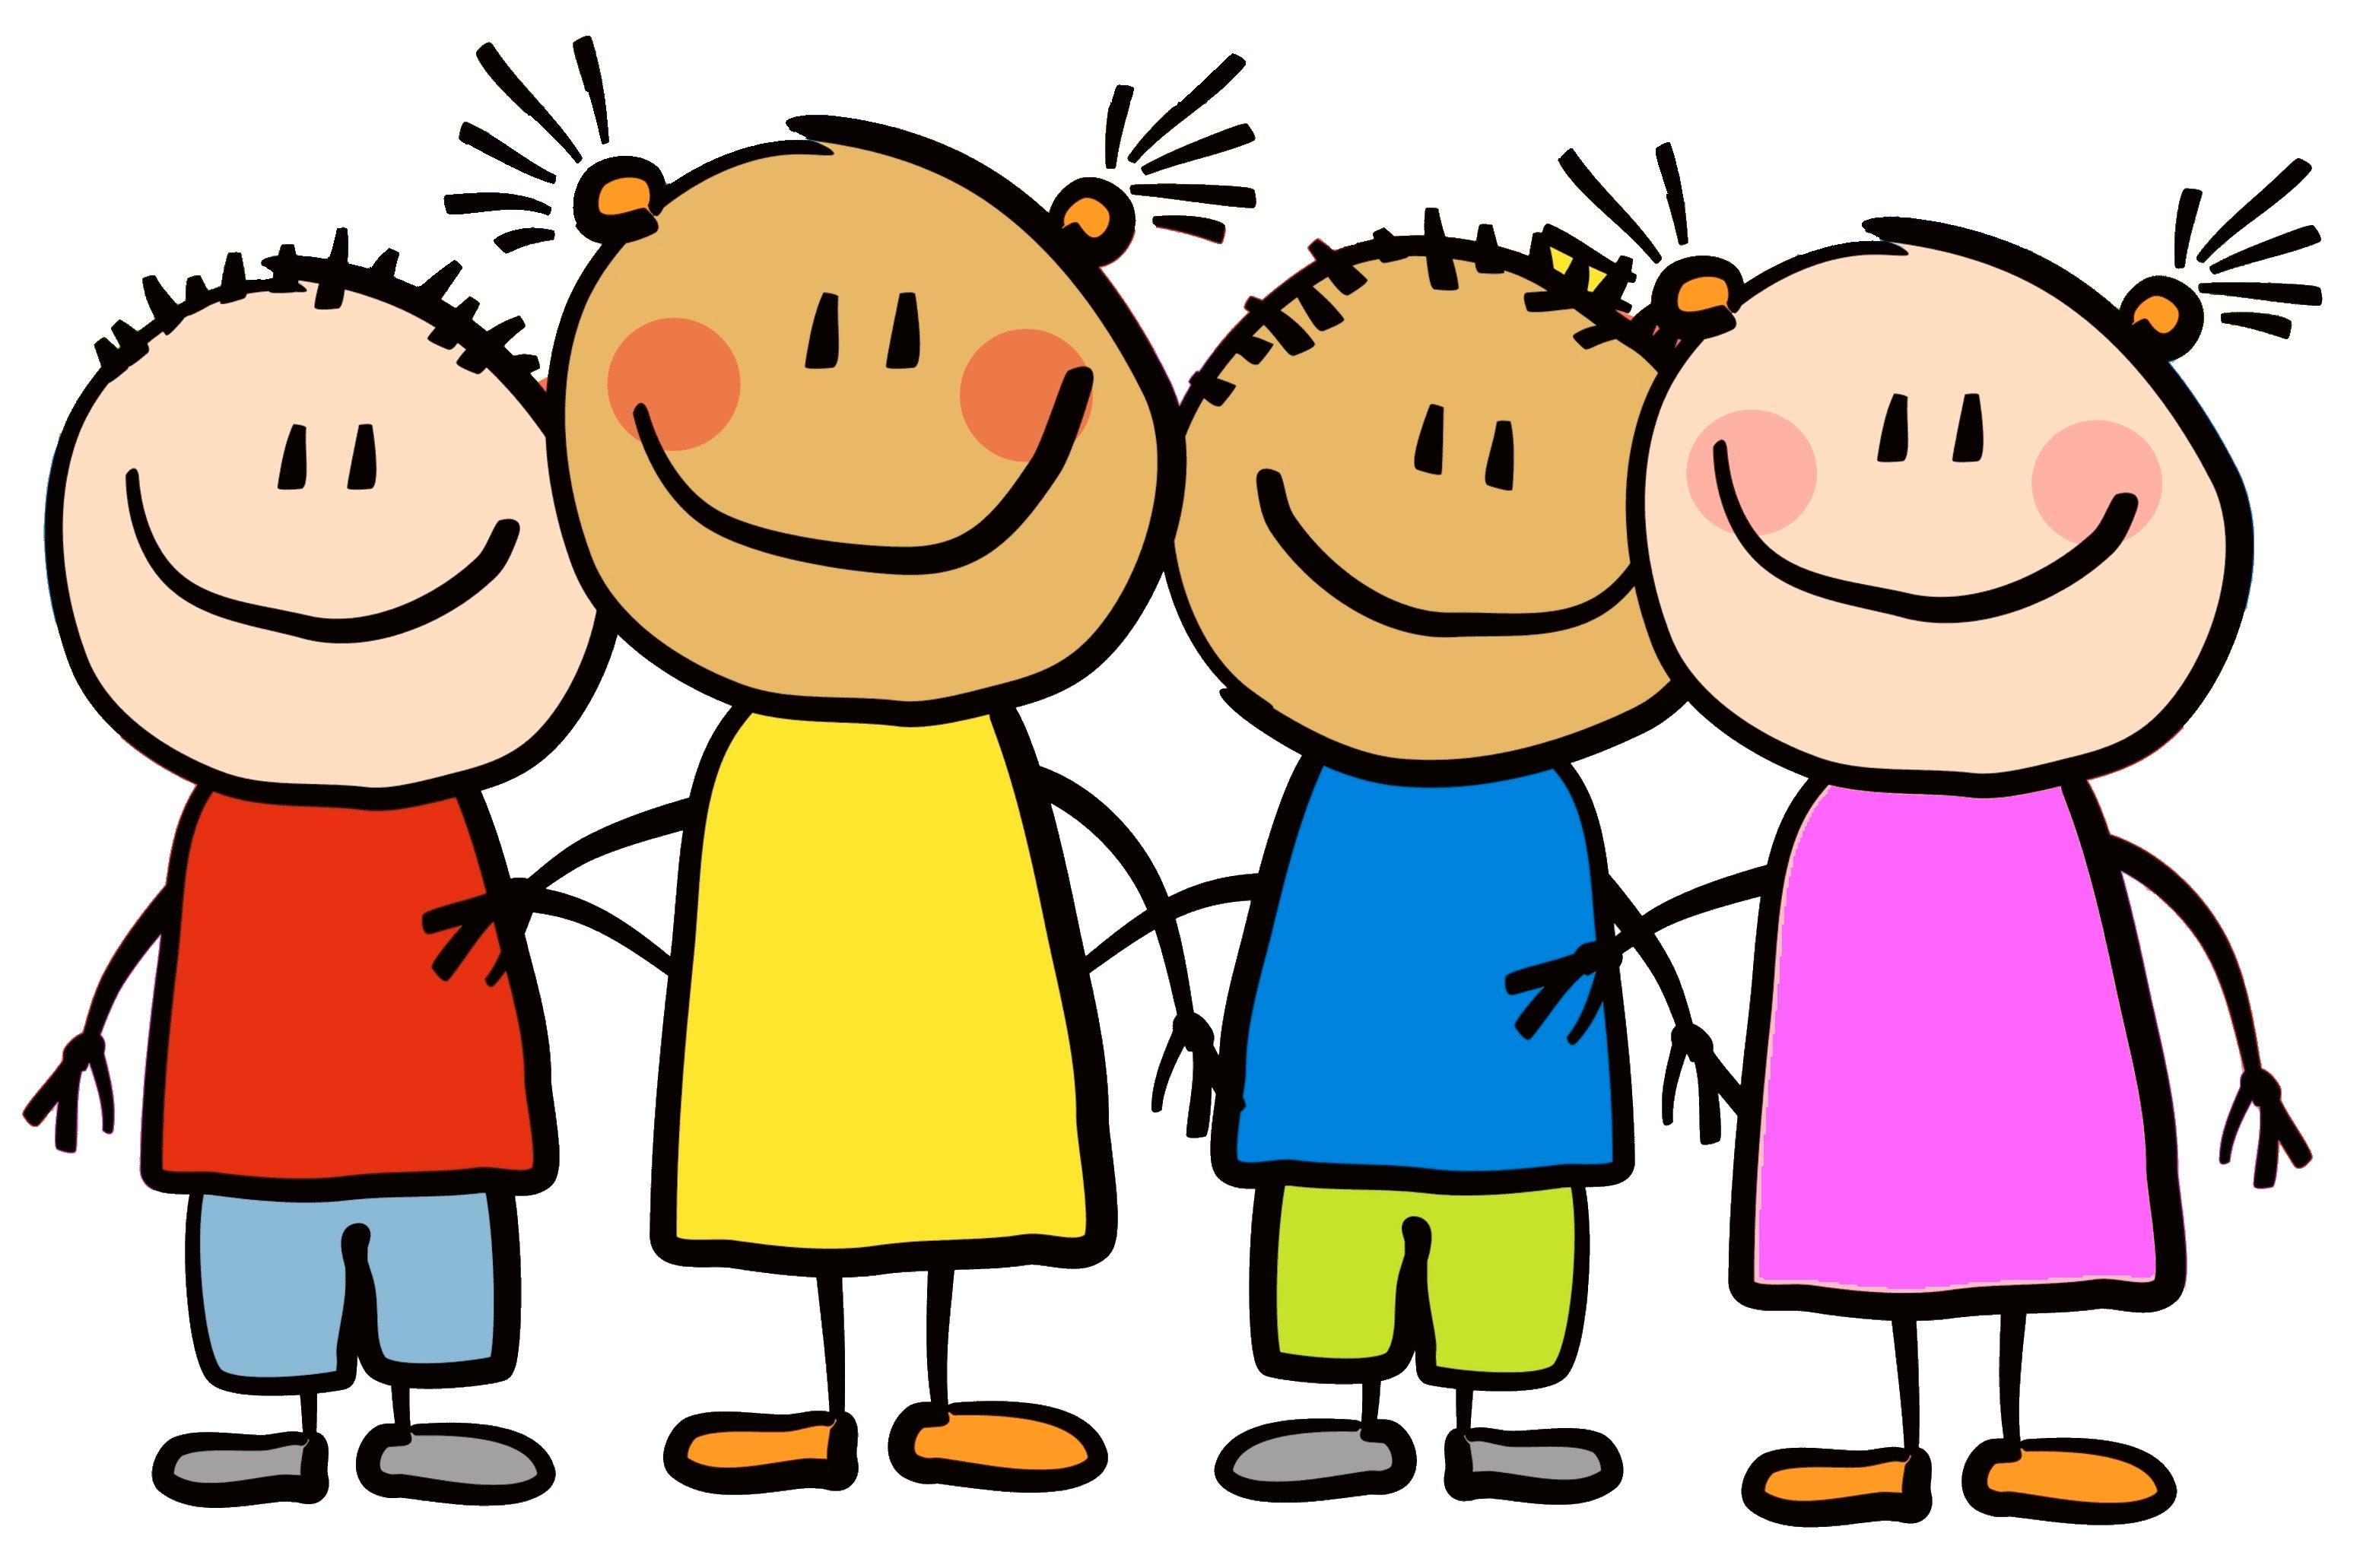 7 children clipart black and white stock cartoon-little-kids-happy-clipart-7 | Elkhorn Public Schools Foundation black and white stock